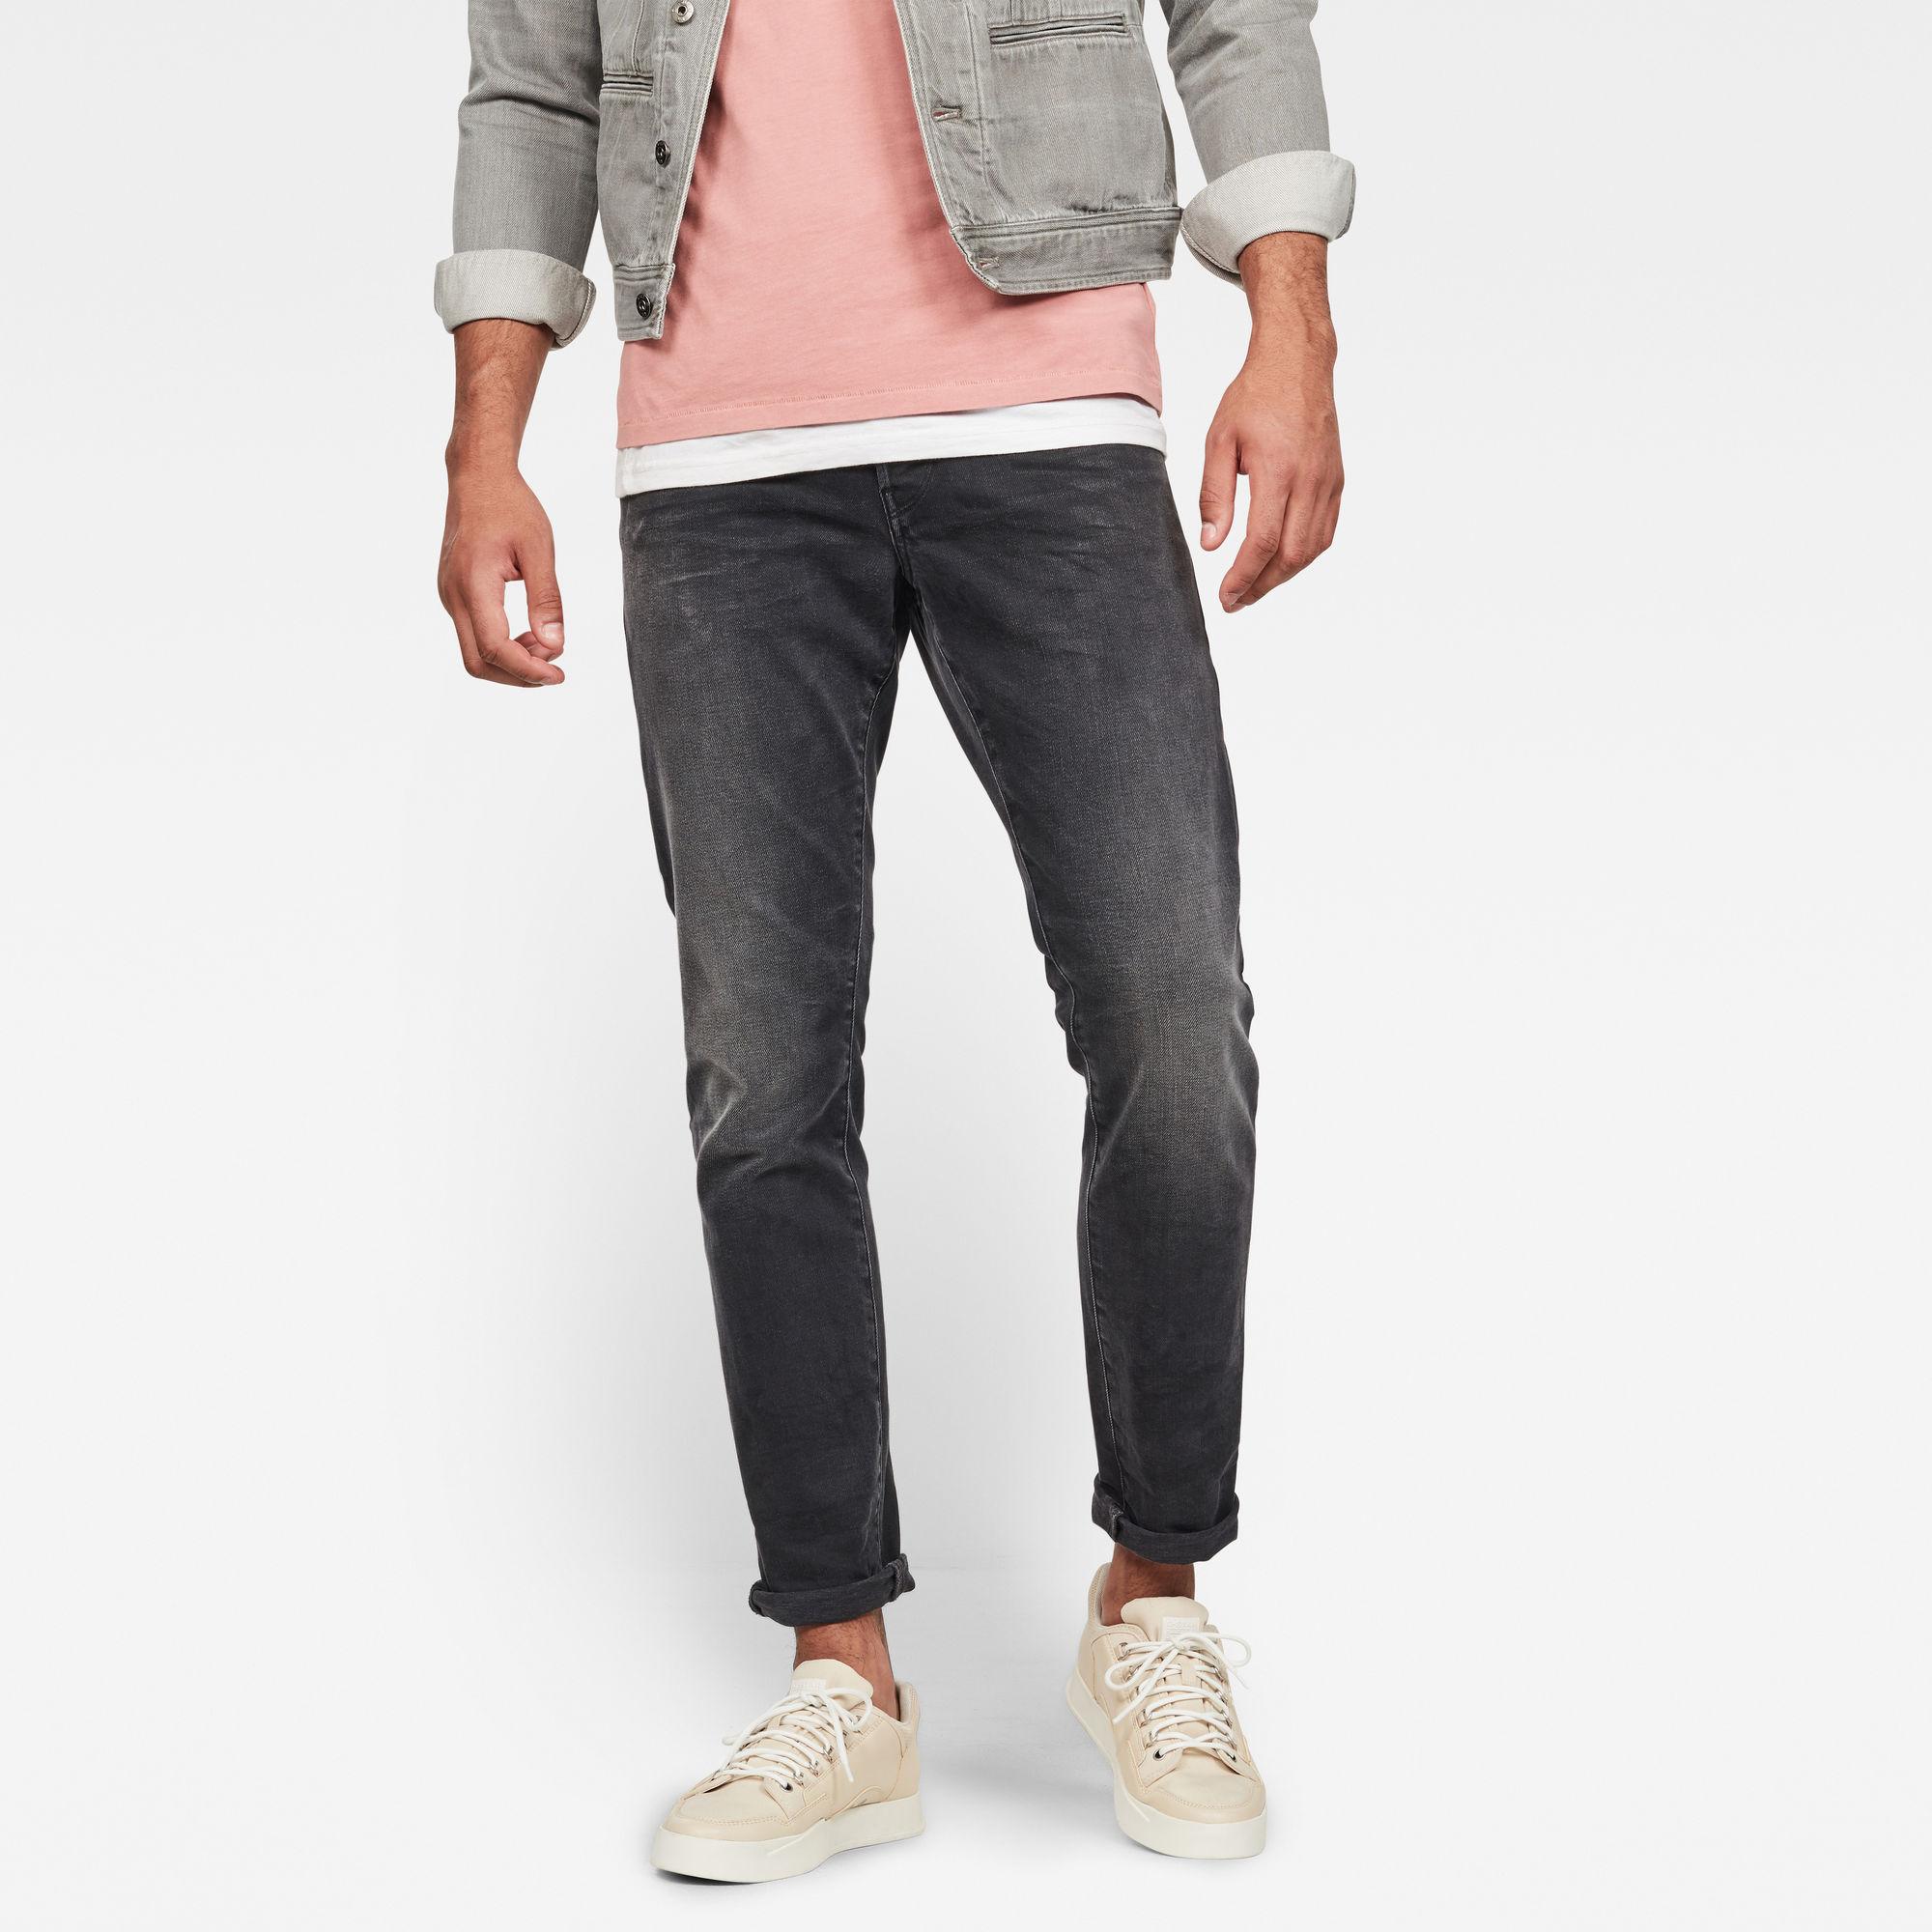 G-Star RAW Heren 3301 Regular Tapered Jeans Zwart